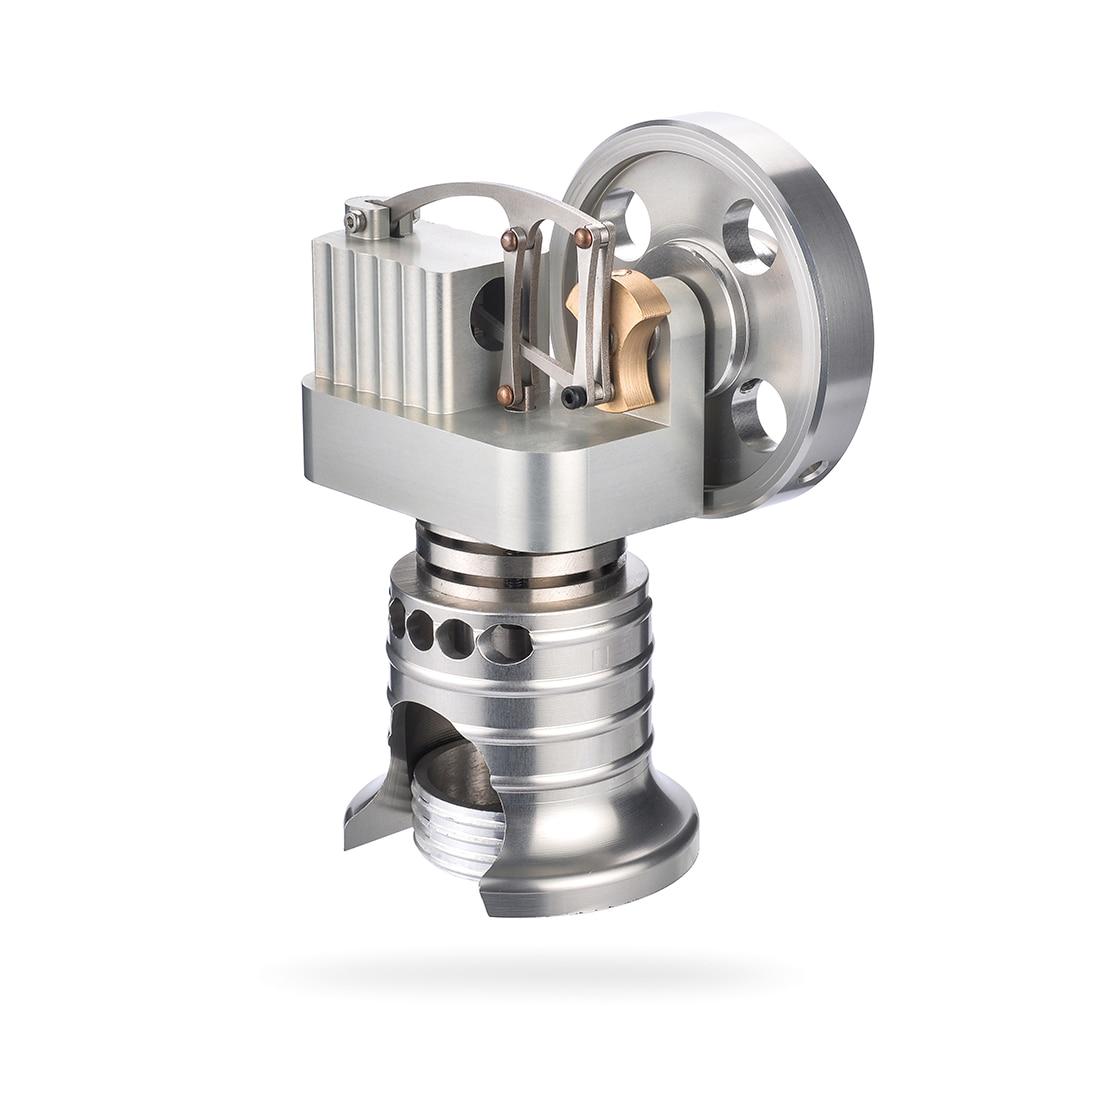 NFSTRIKE Model Building Kits Vertical Type Metal Stirling Engine Motor with Alcohol Burner Kids Early Development Toys Hot Sale